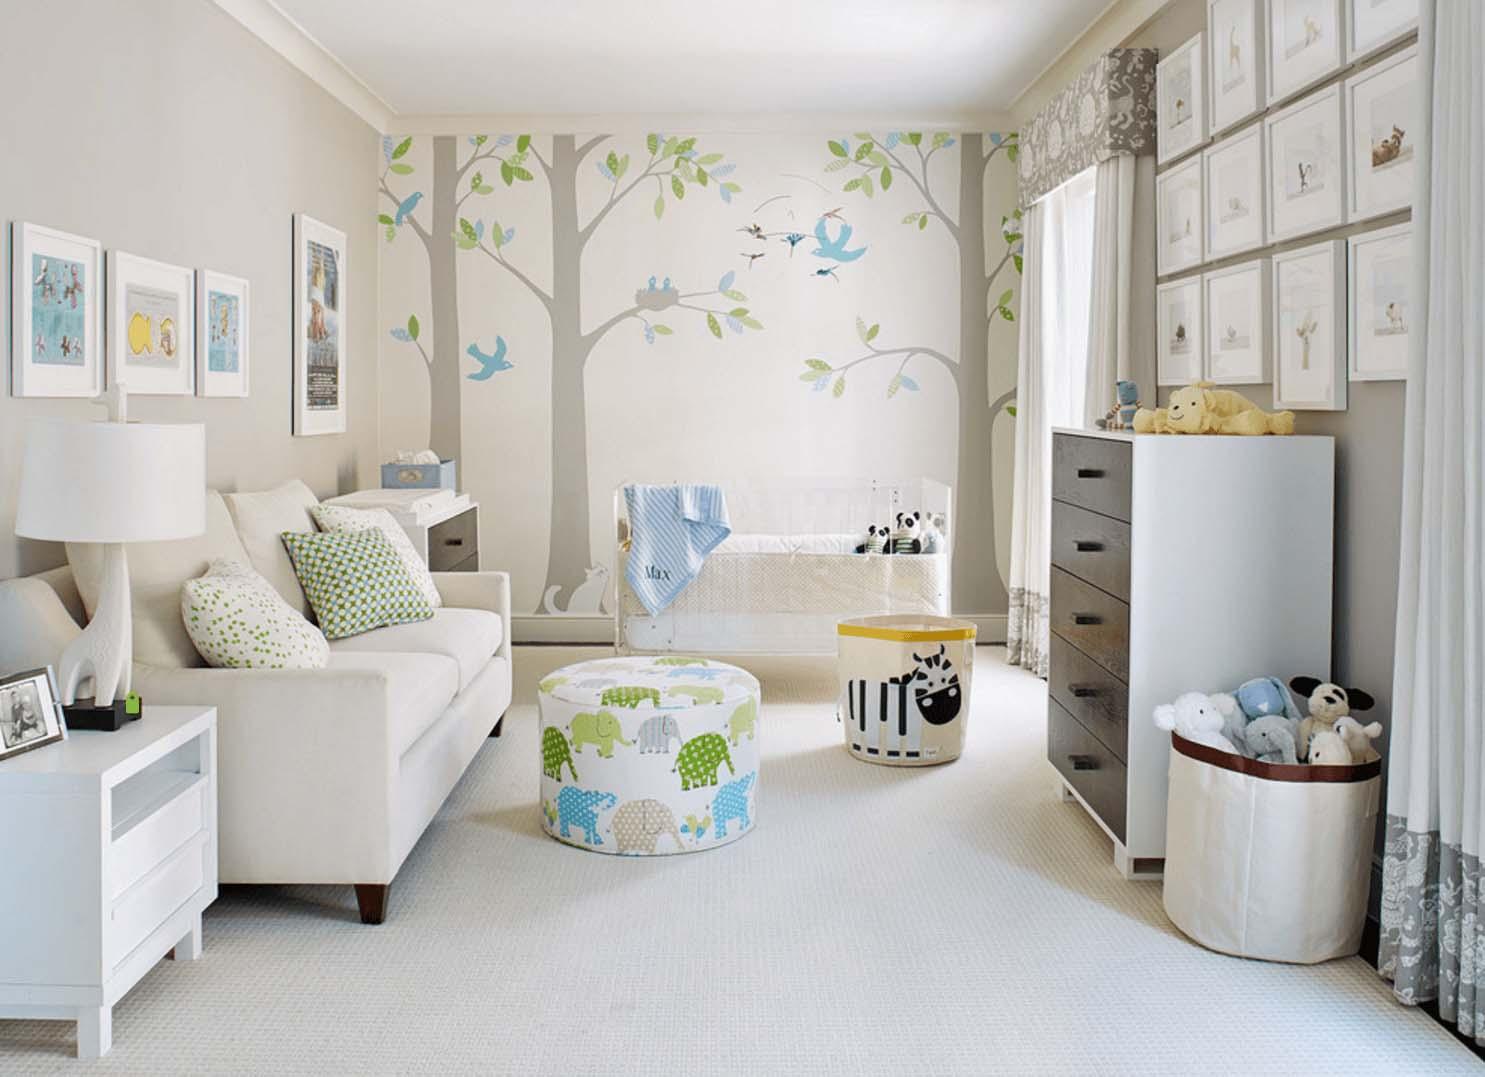 flex room ideas. design ideas for your flex room. a new nursery.